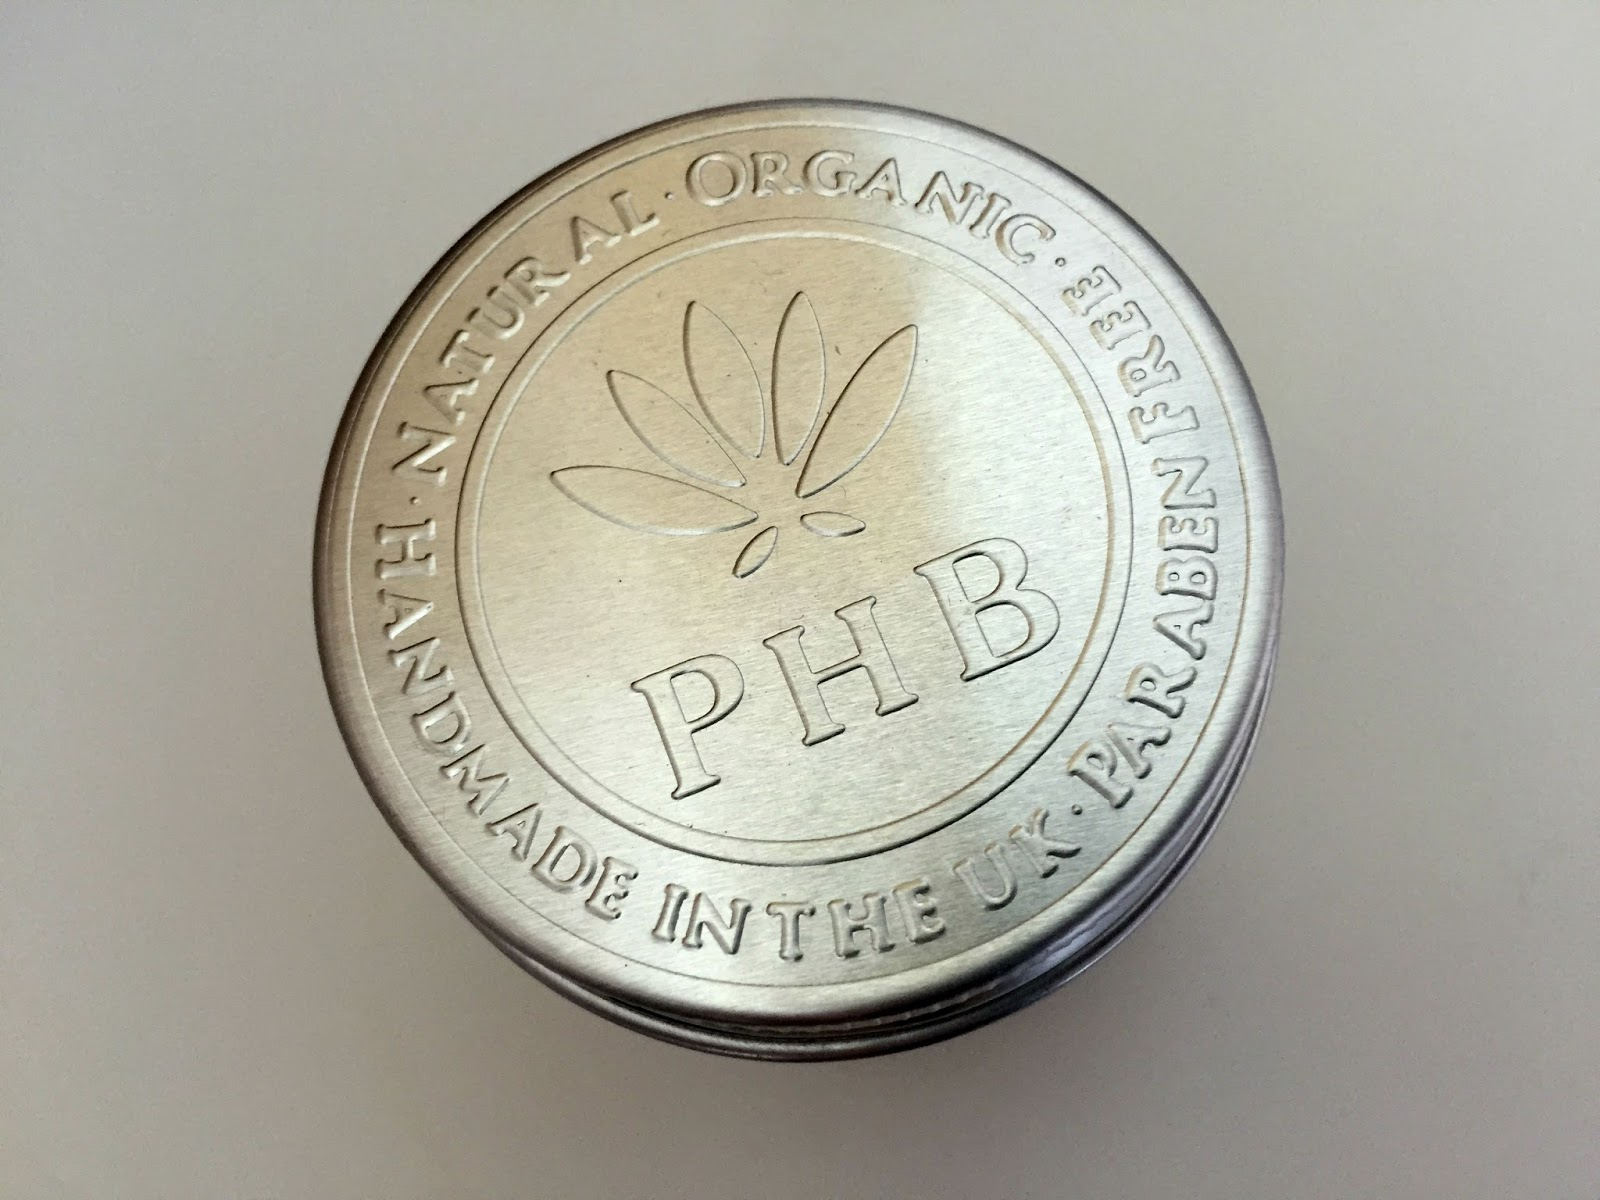 PHB Ethical Beauty Skin Brighten Gel